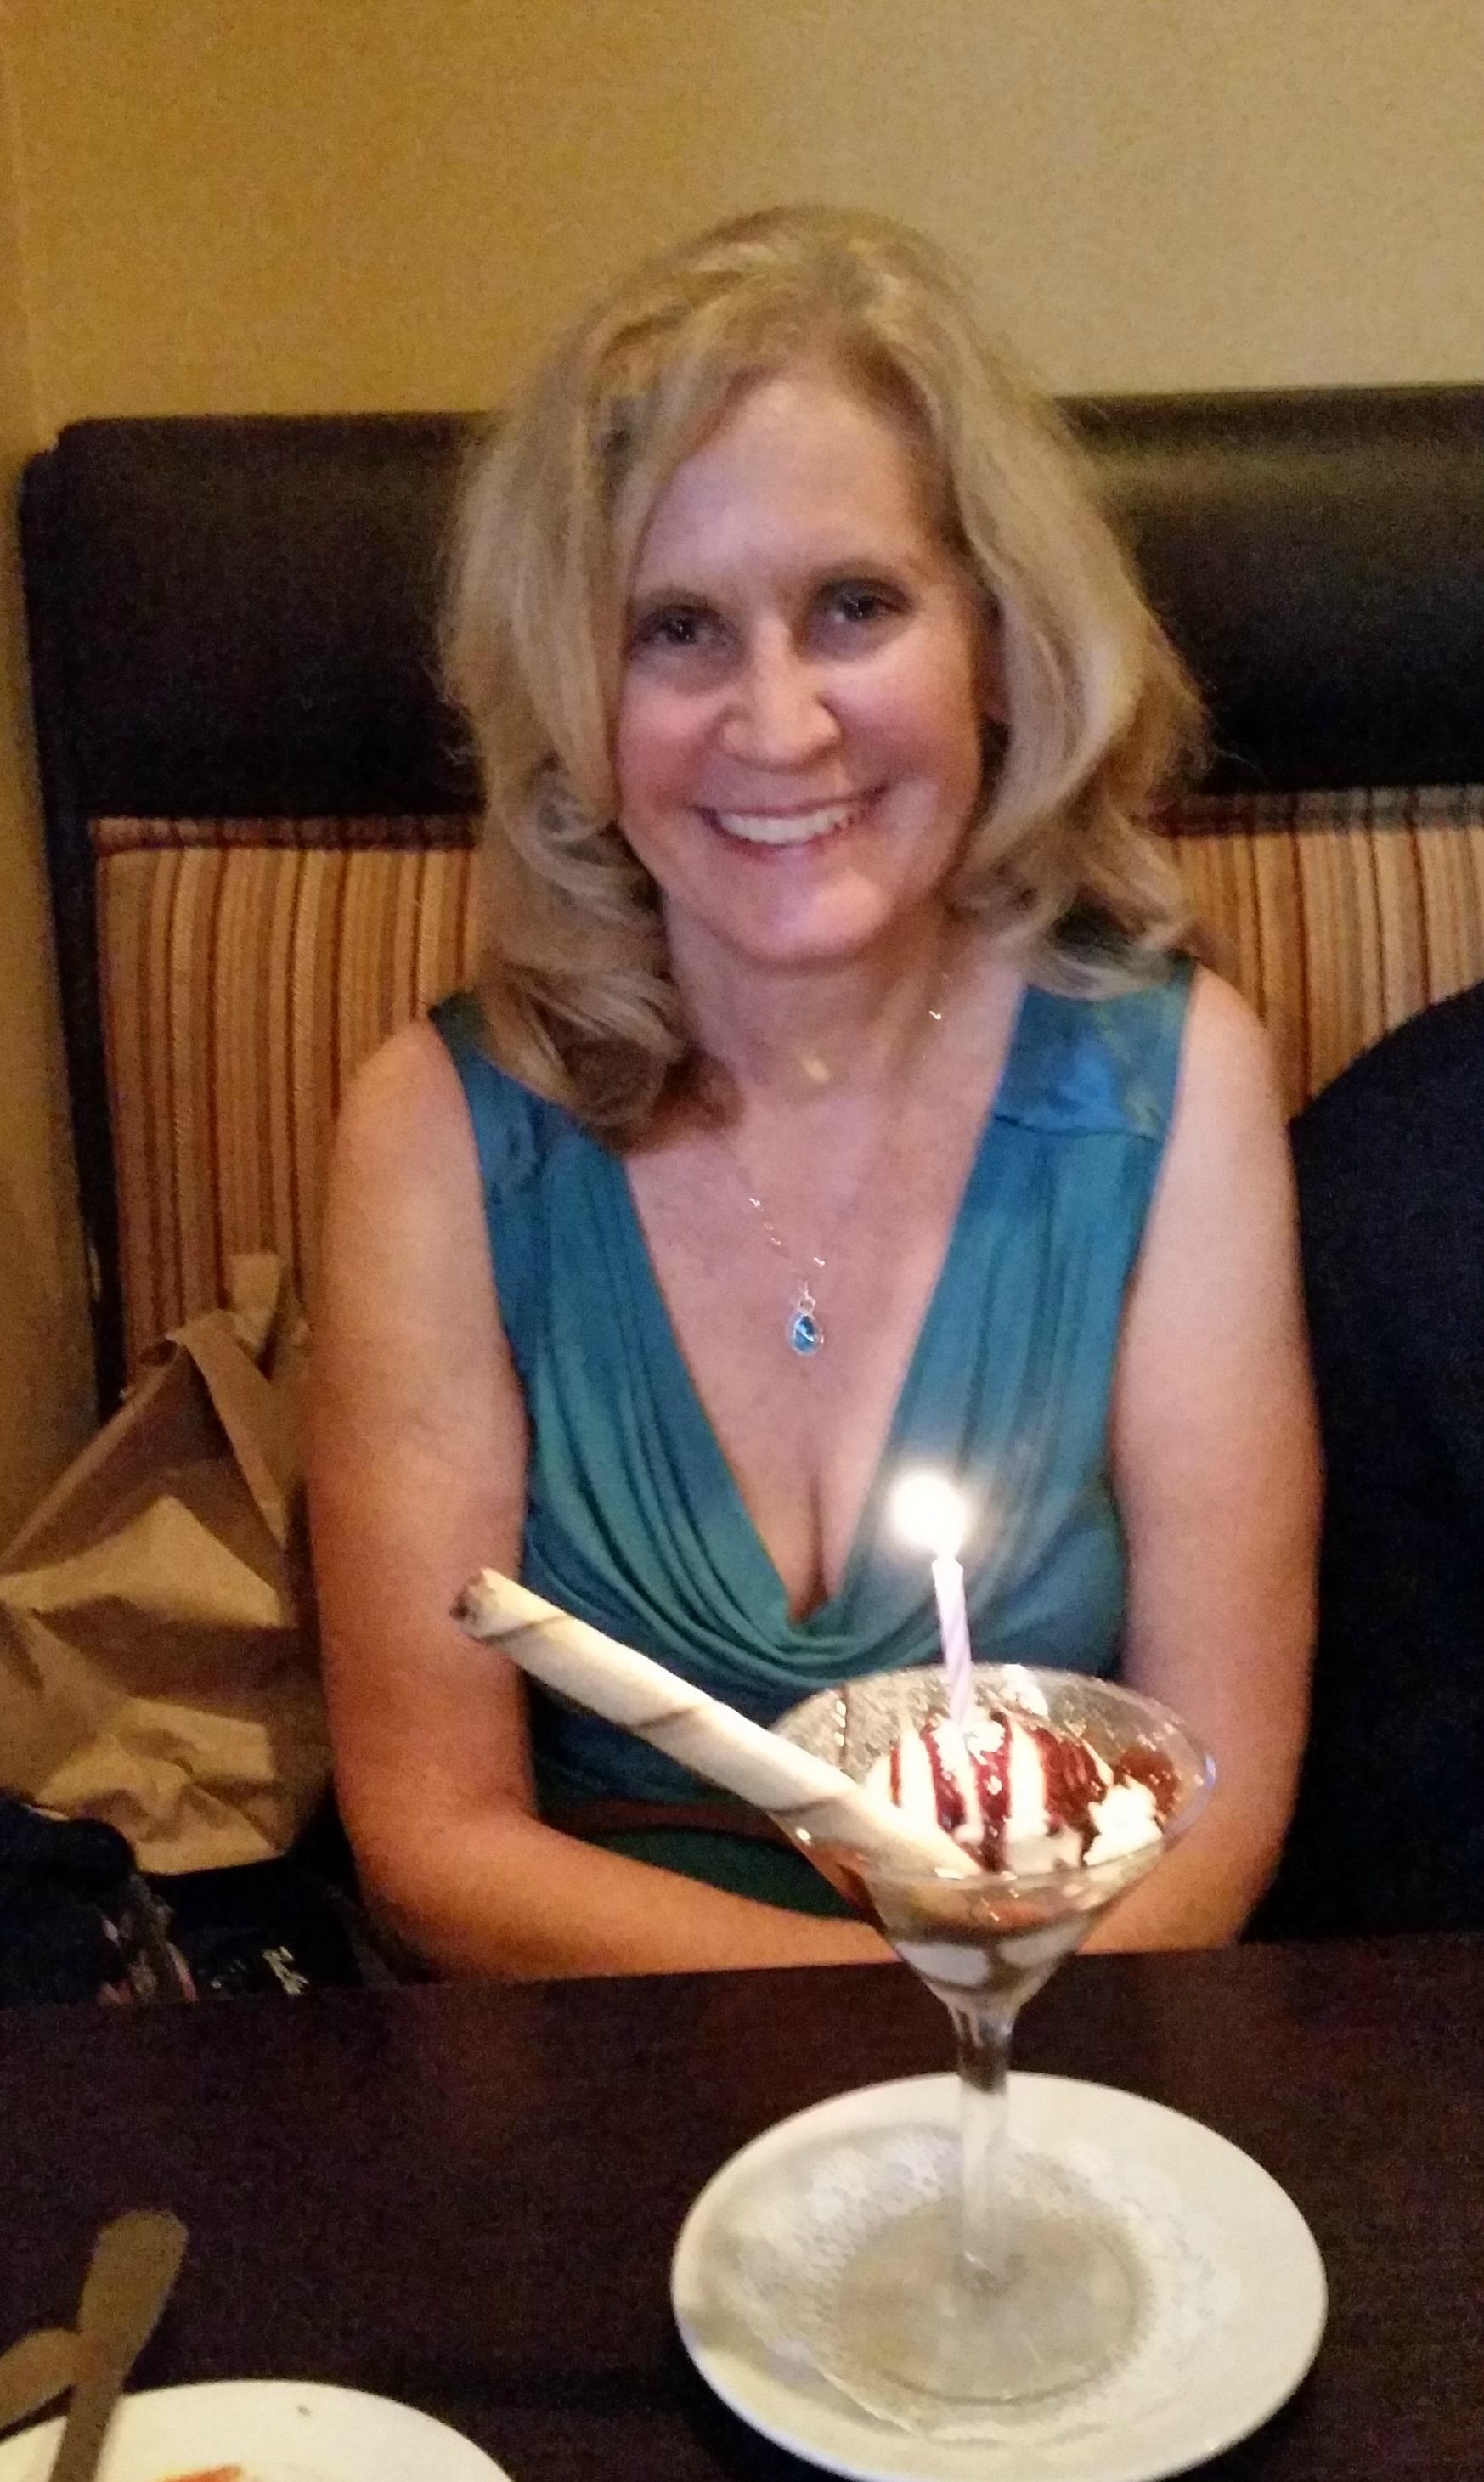 cucina alessa birthday gelato